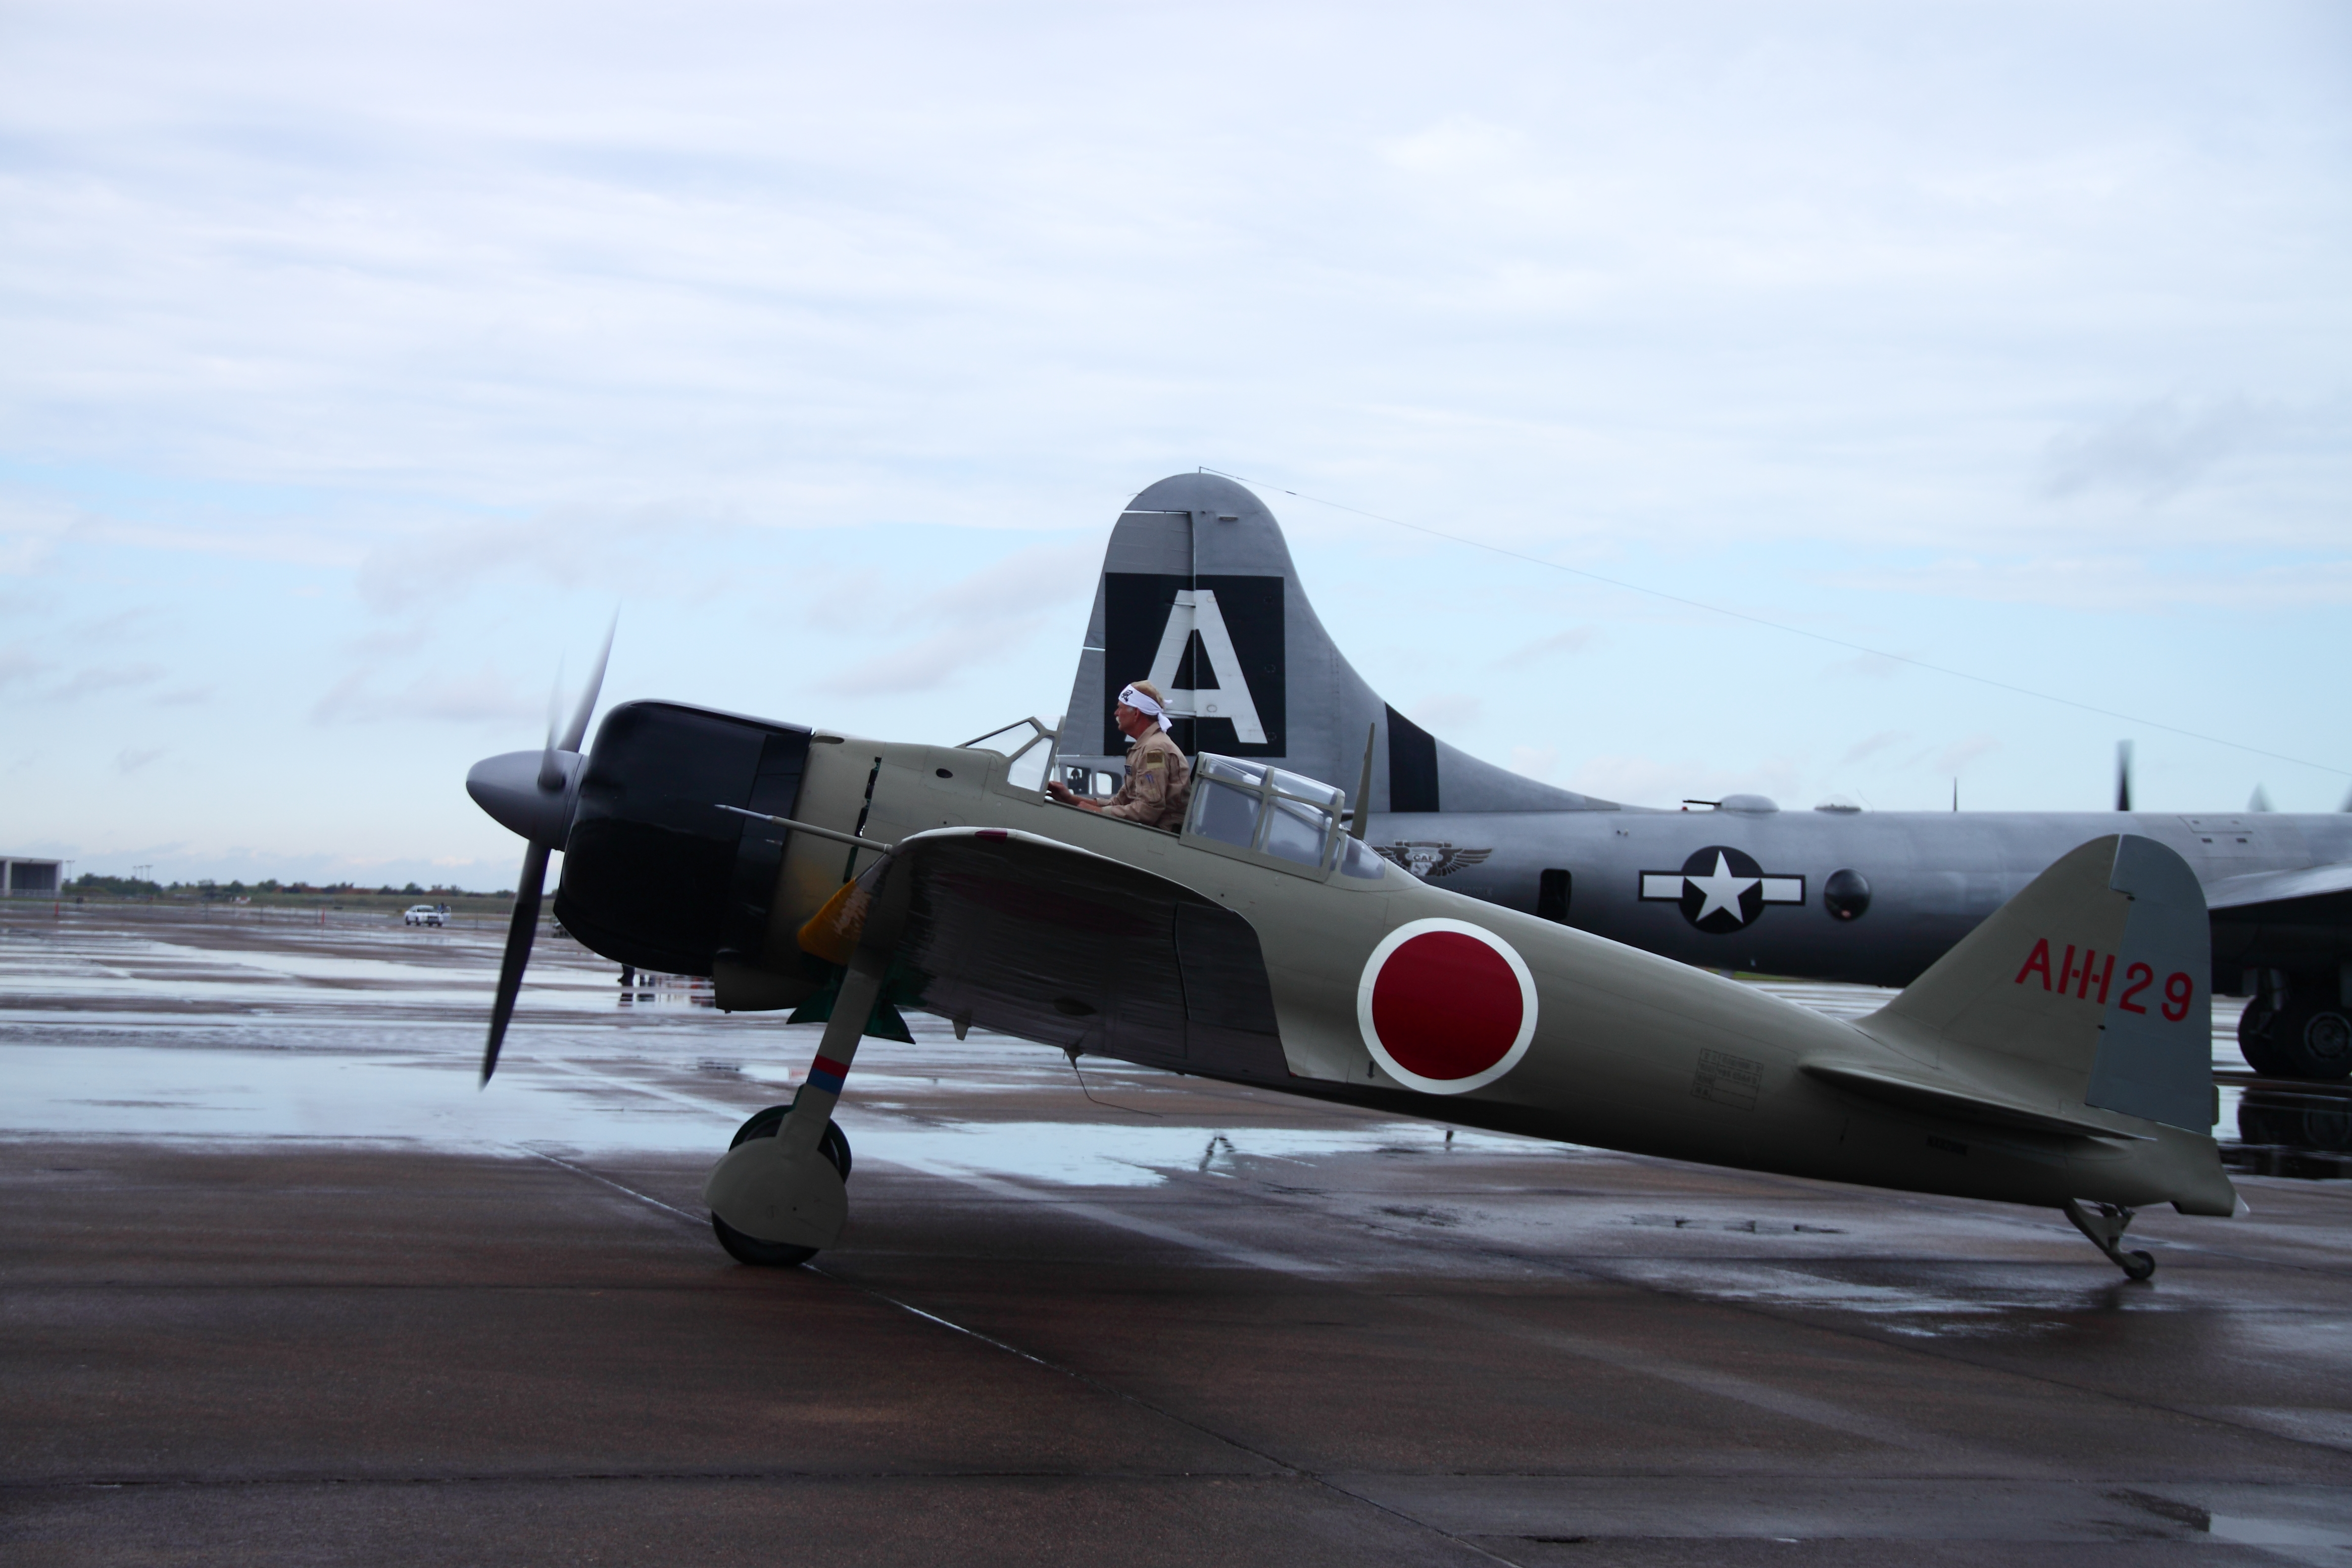 File:IMG 2568 Nakajima A6M2-21 ZeroZeke N8280K.jpg